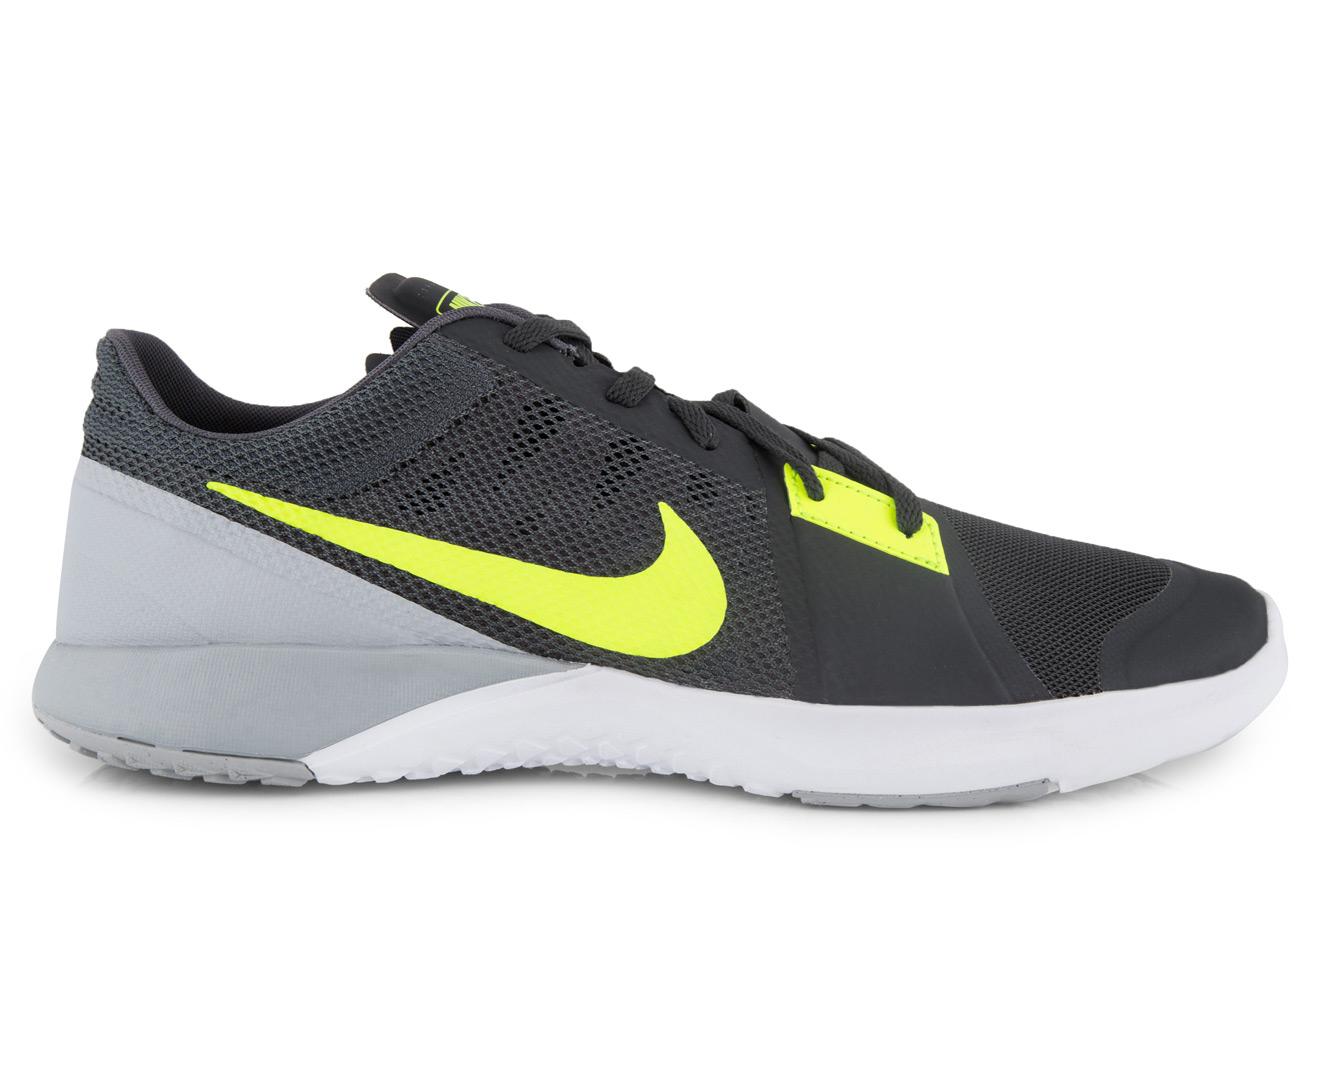 get cheap e9ad0 1c39e Nike Men's FS Lite Trainer 3 Shoe - Anthracite/Volt/Wolf Grey